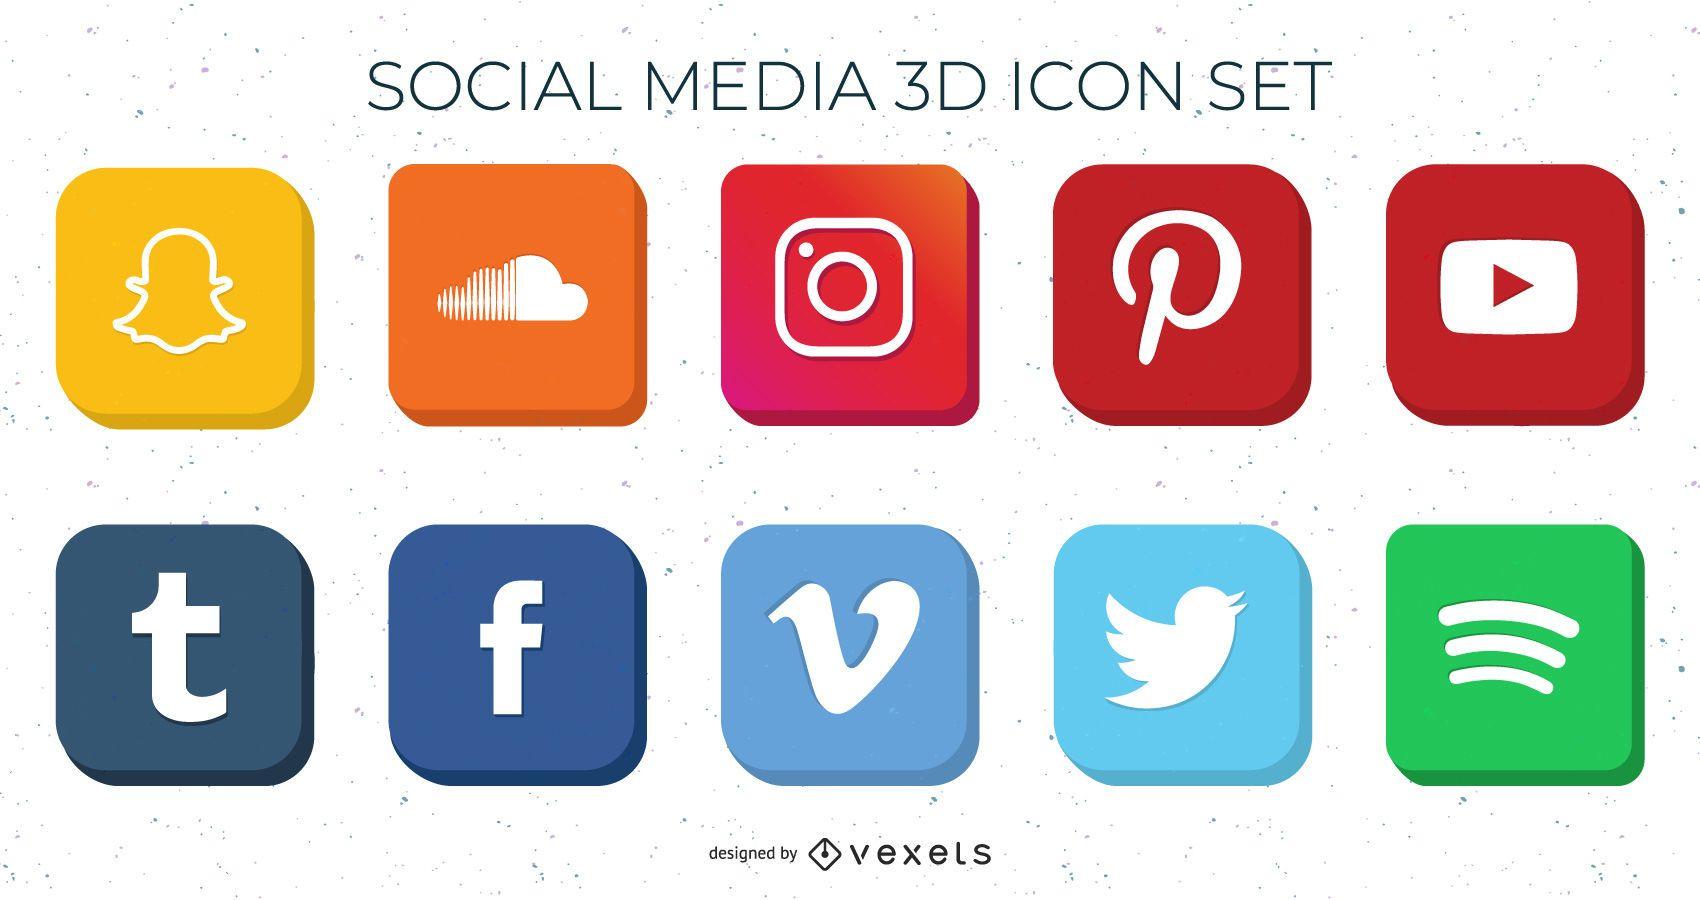 3D High Detail Social Media Icon Pack